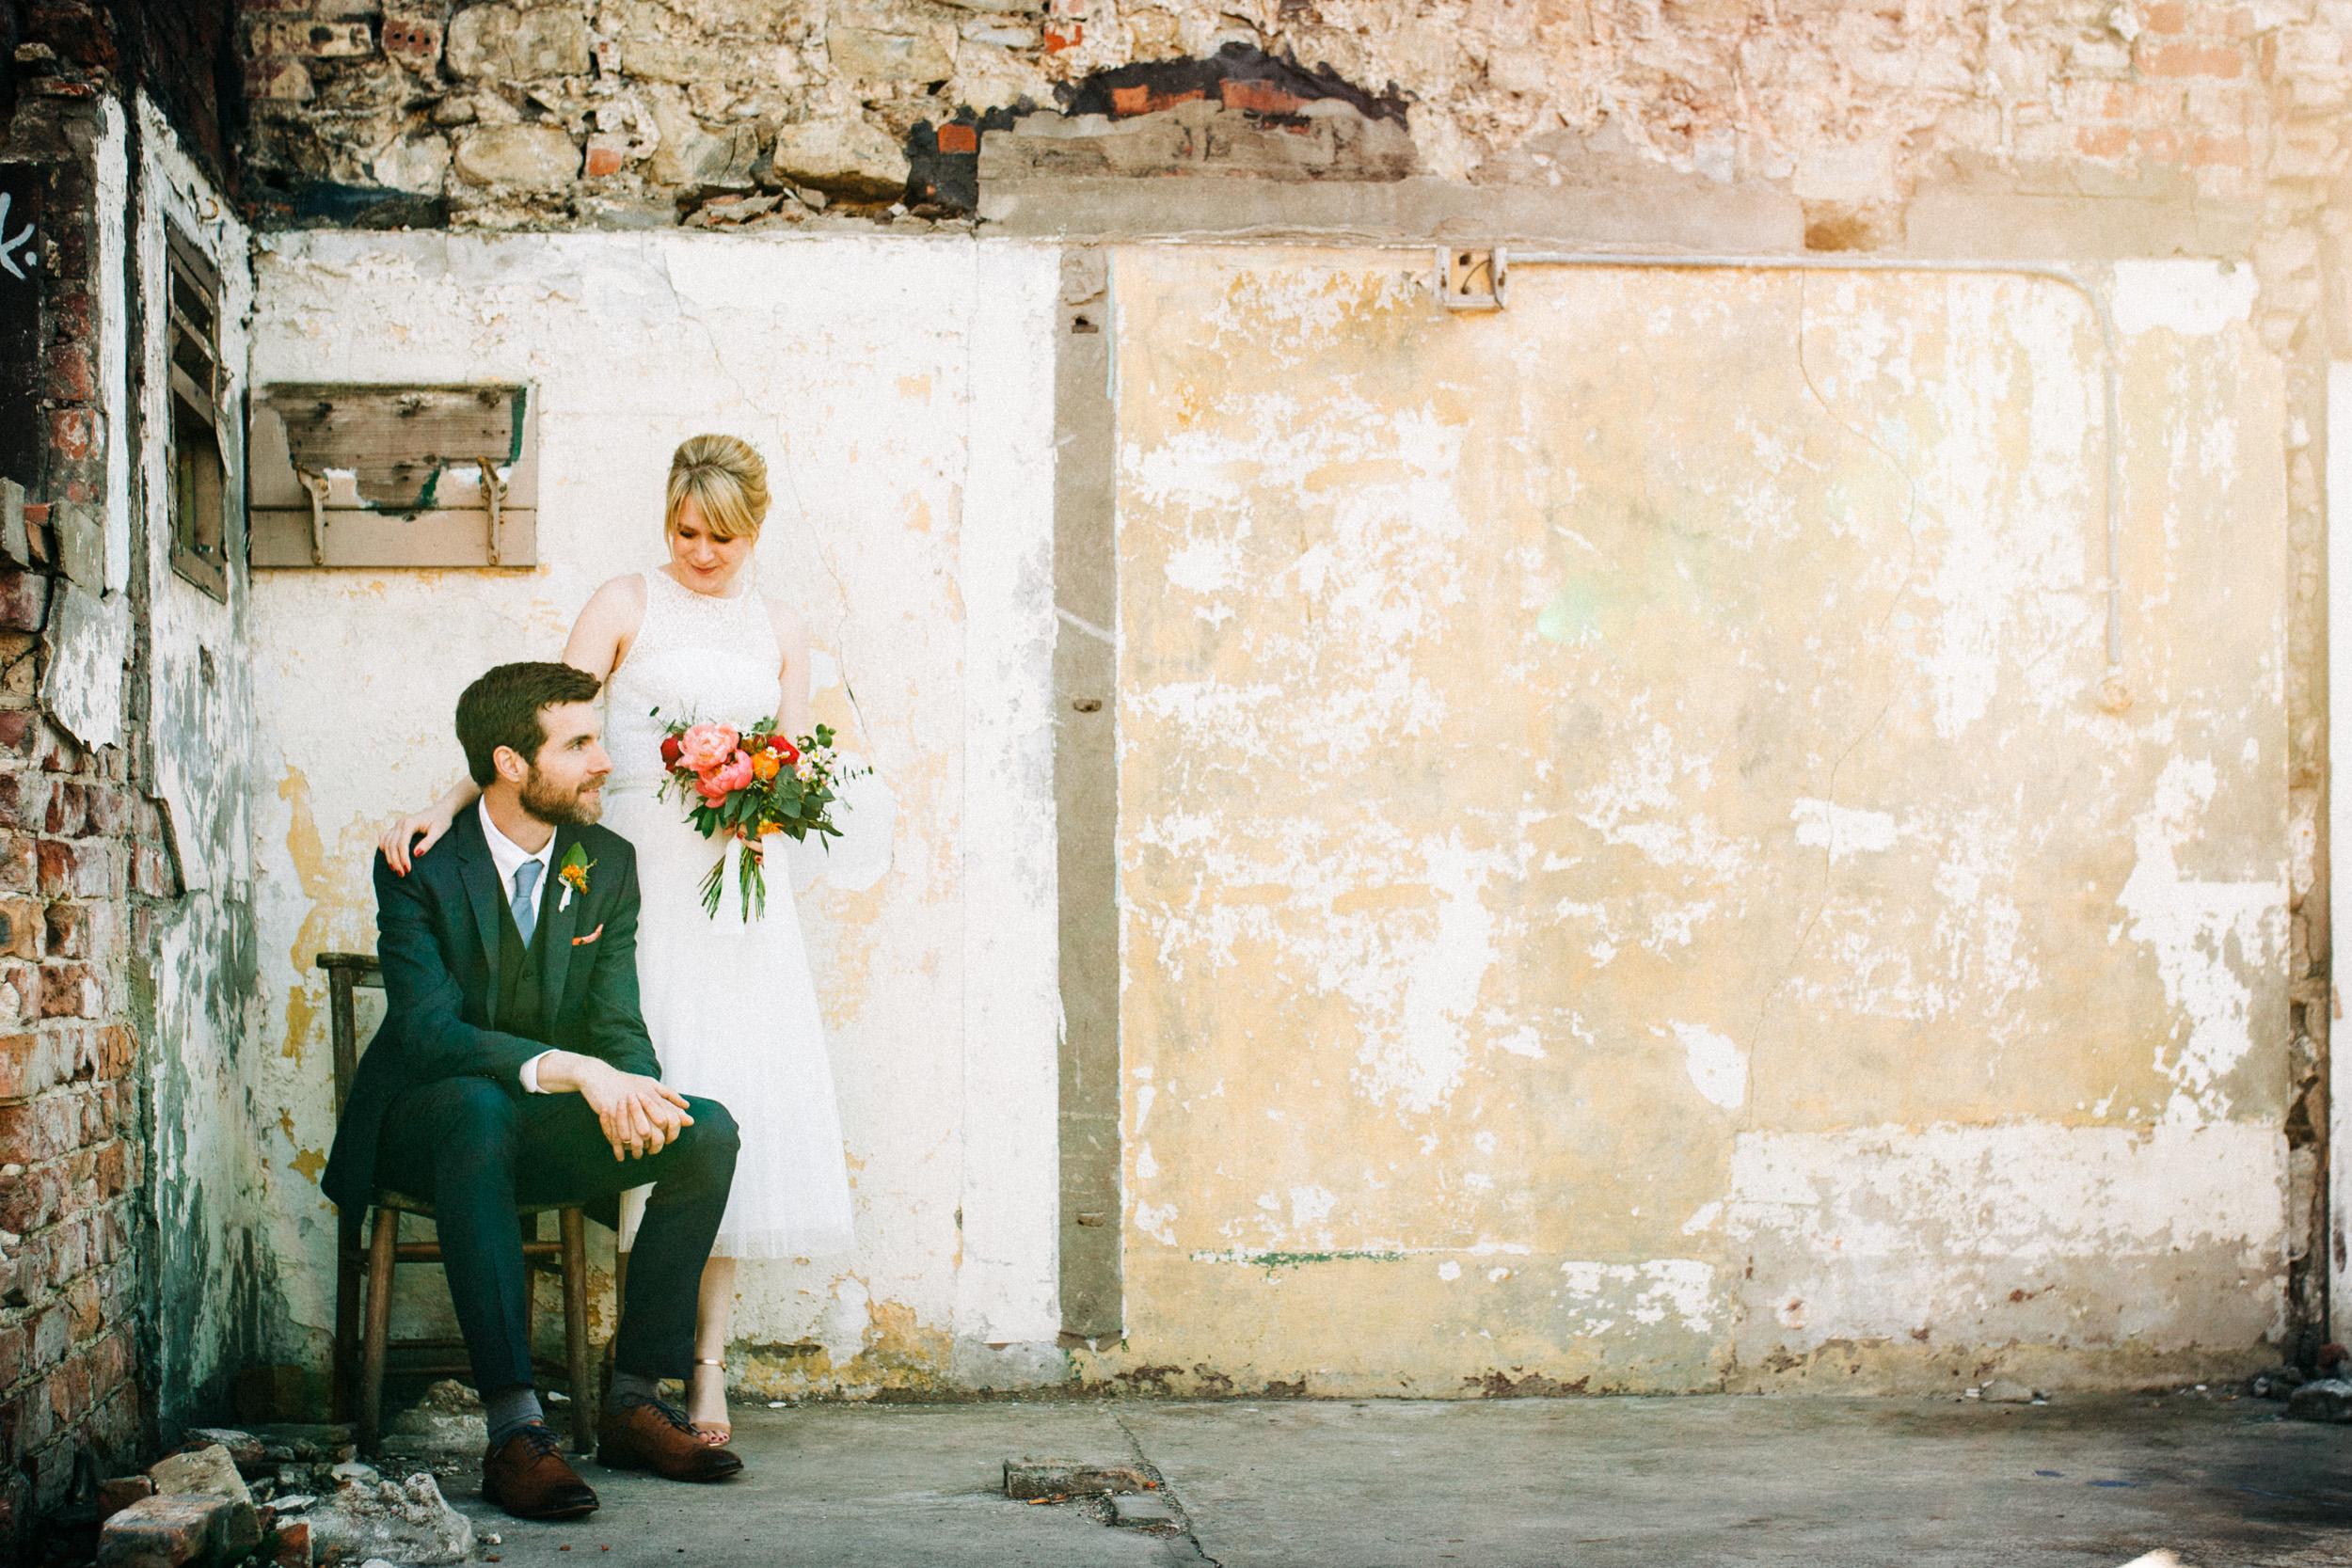 Cardiff Photographer Alex Sedgmond - Photography South Wales - The Printhaus, Cardiff Wedding Photography-18.jpg